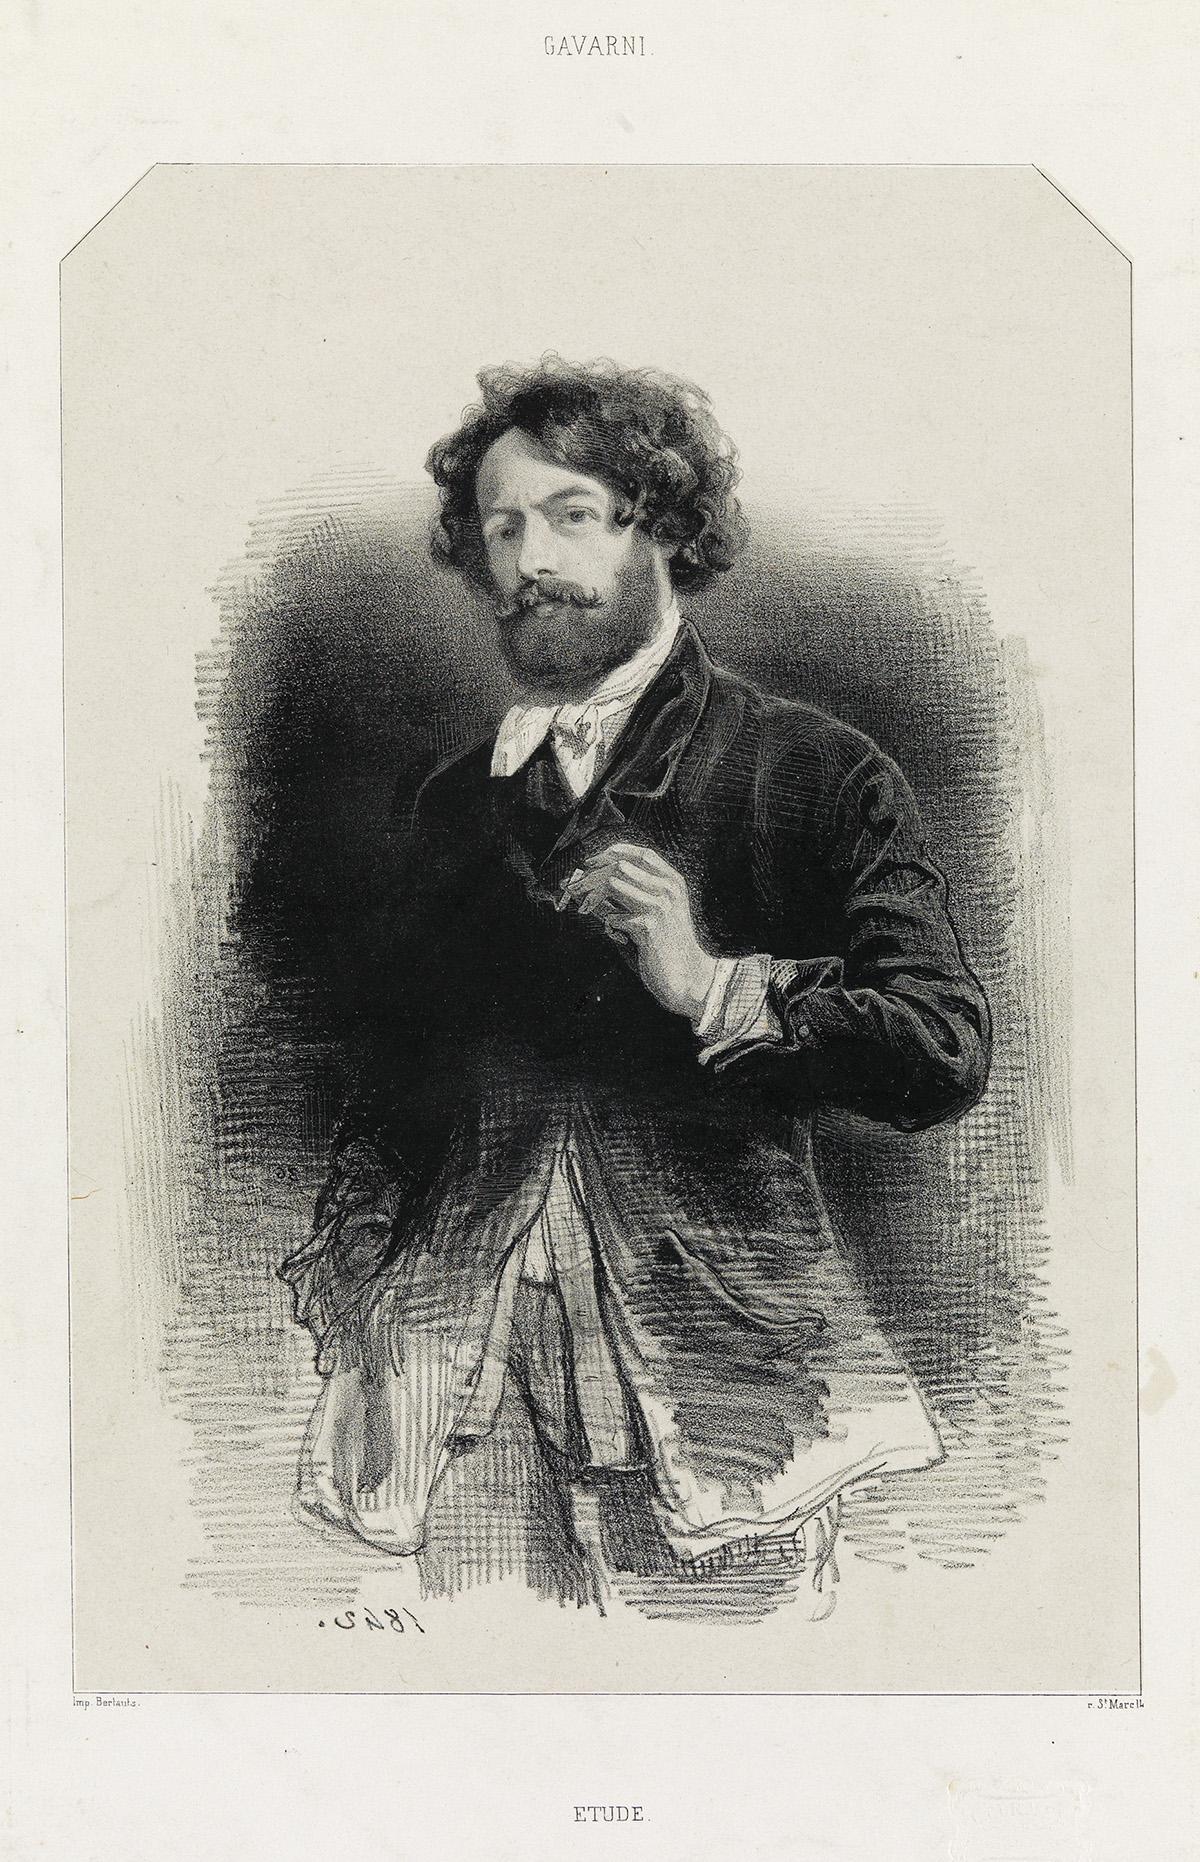 PAUL-GAVARNI-Group-of-8-lithographs